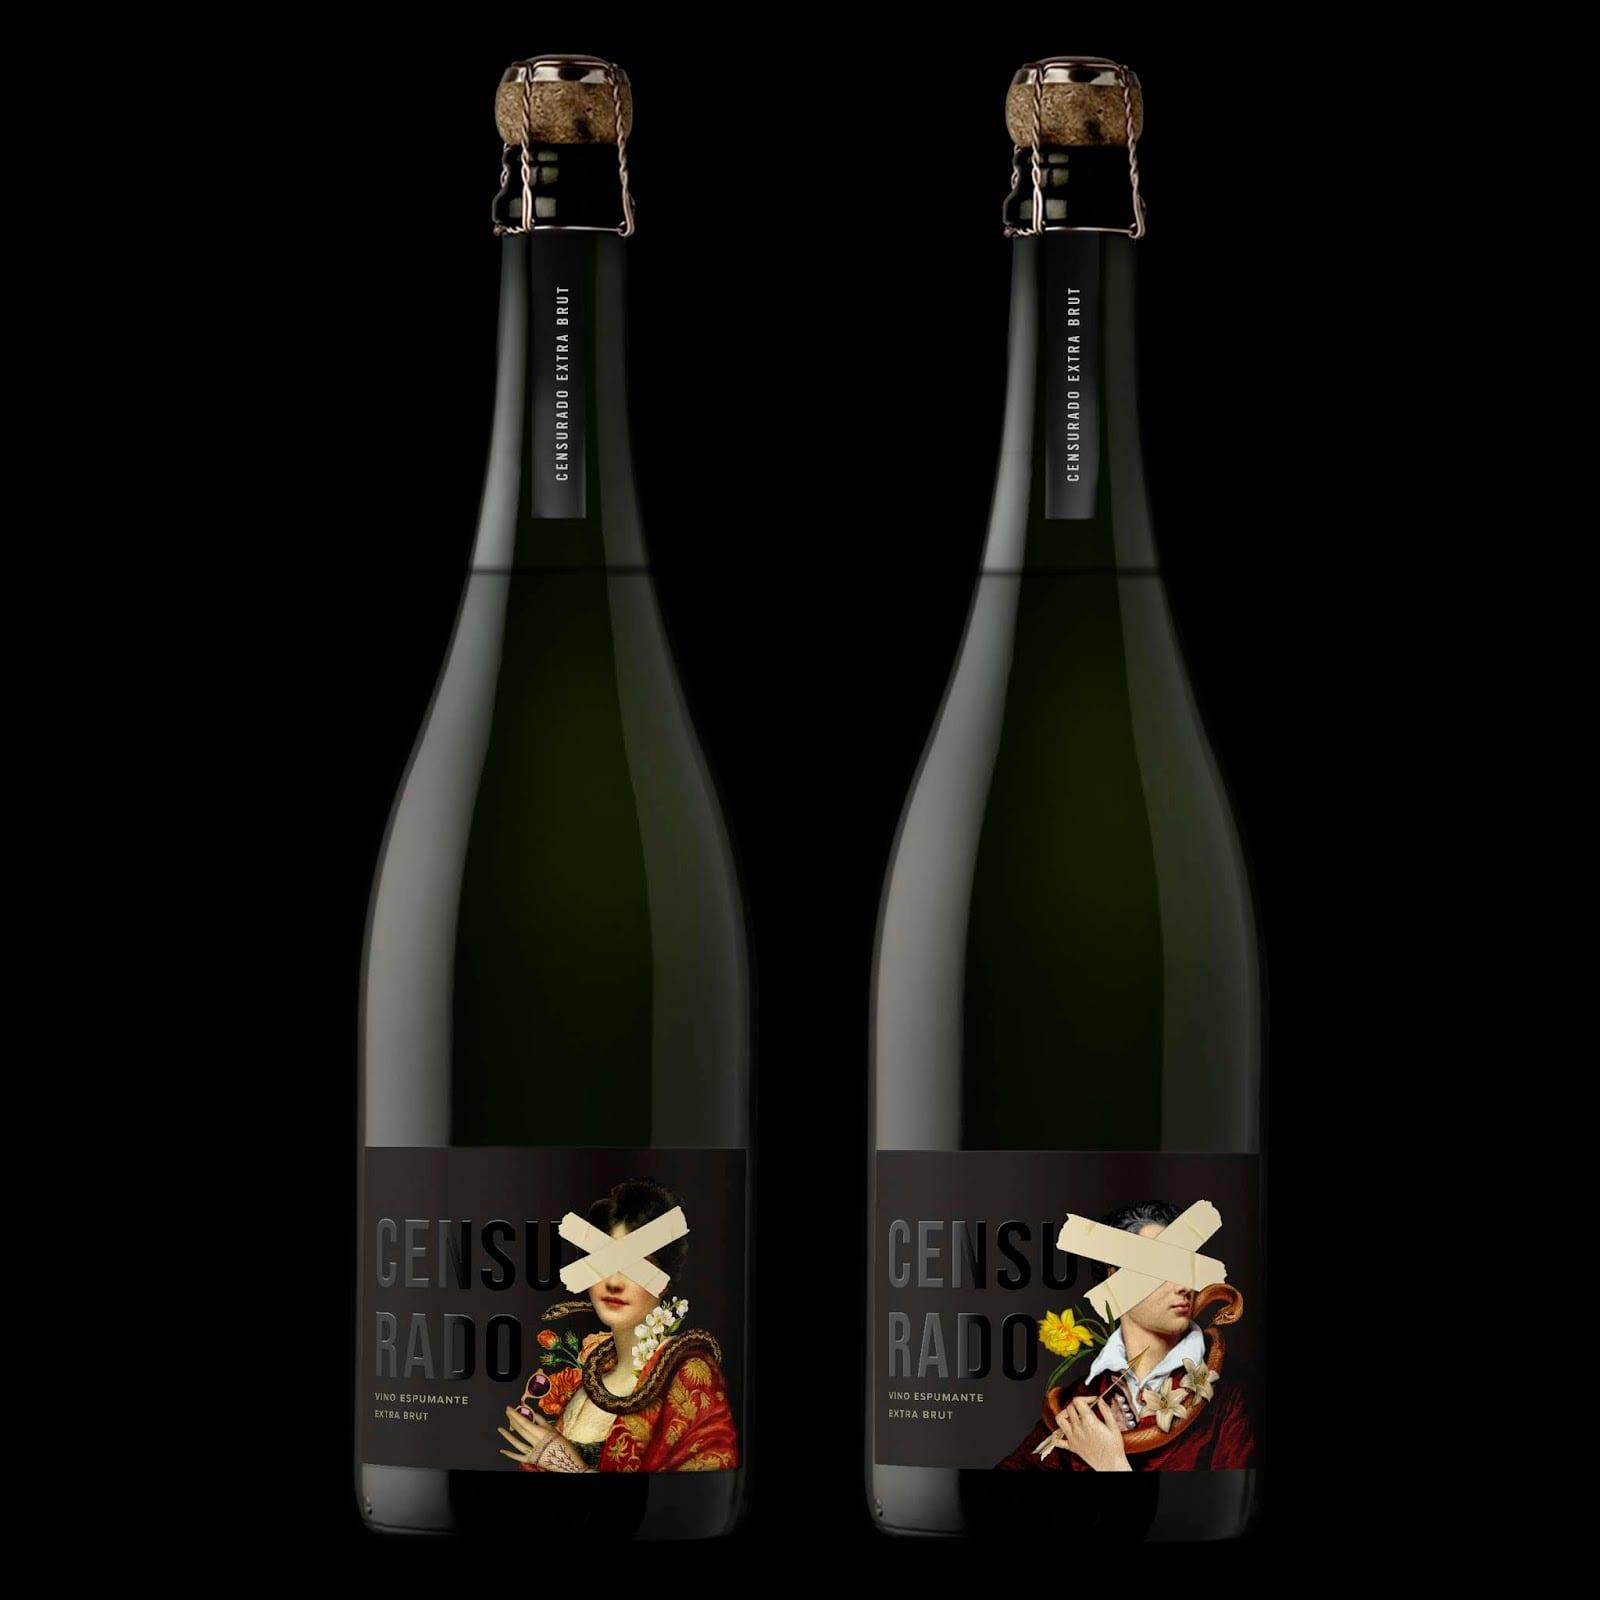 1 censurado big - Ach, tie obaly – Censurado wine